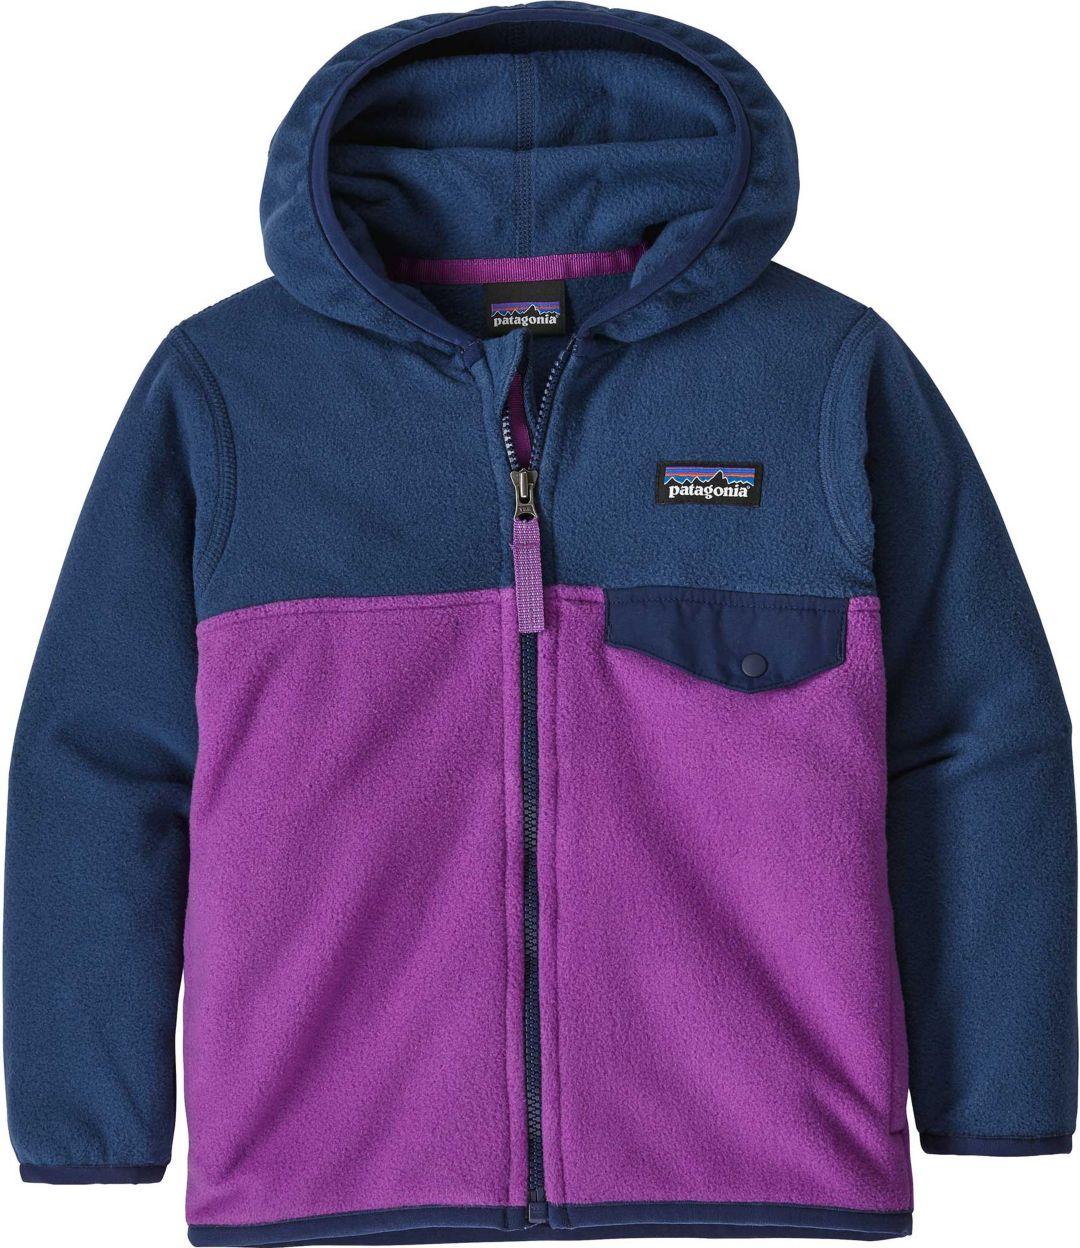 3459d657882 Patagonia Toddler Micro D Snap-T Fleece Jacket 1